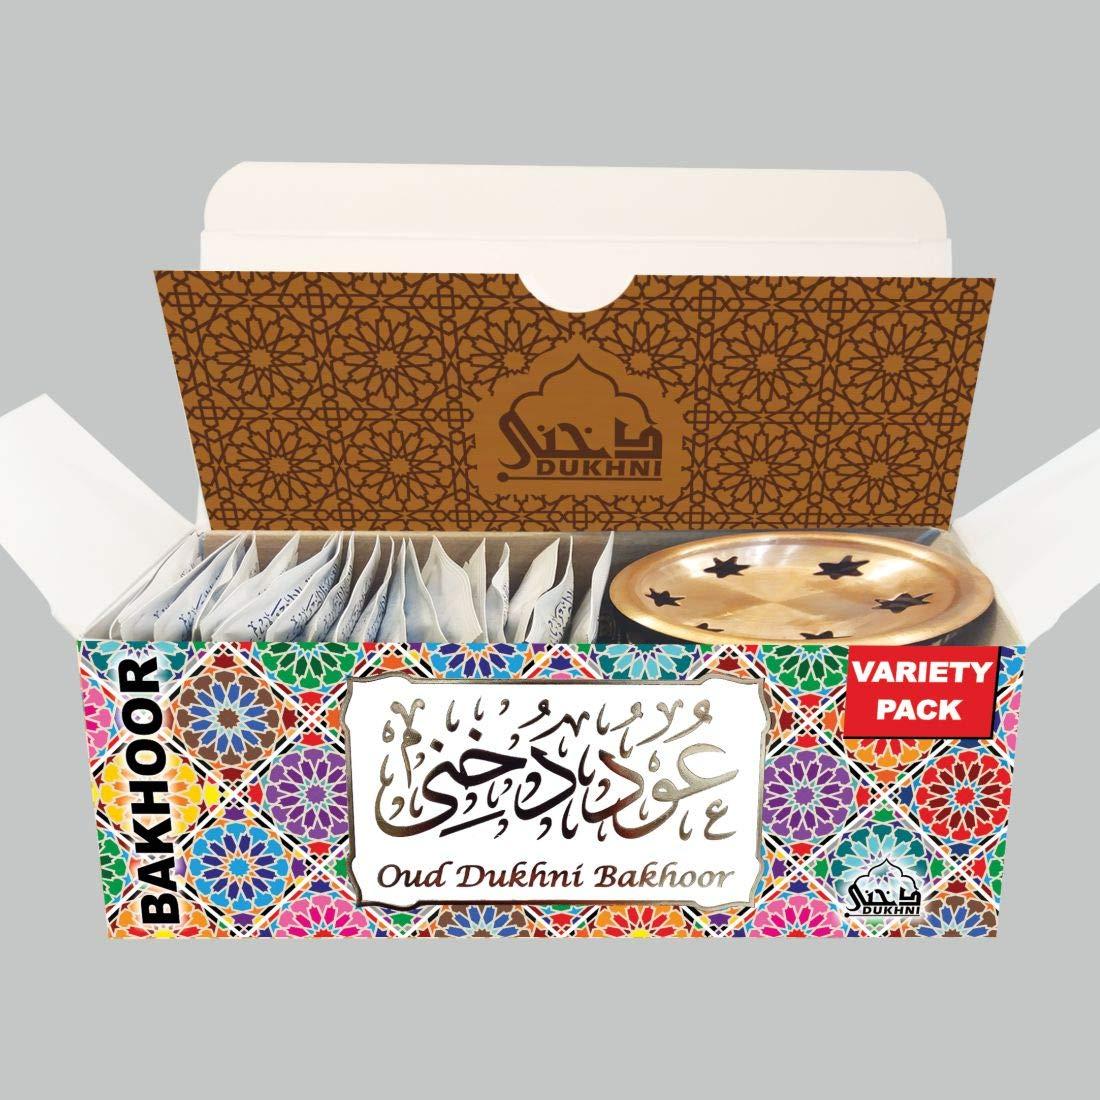 Dukhni Oud Bakhoor Incense Variety Box & Rainbow Bakhoor Burner - Gift Set & Starter Kit by Dukhni (Image #4)